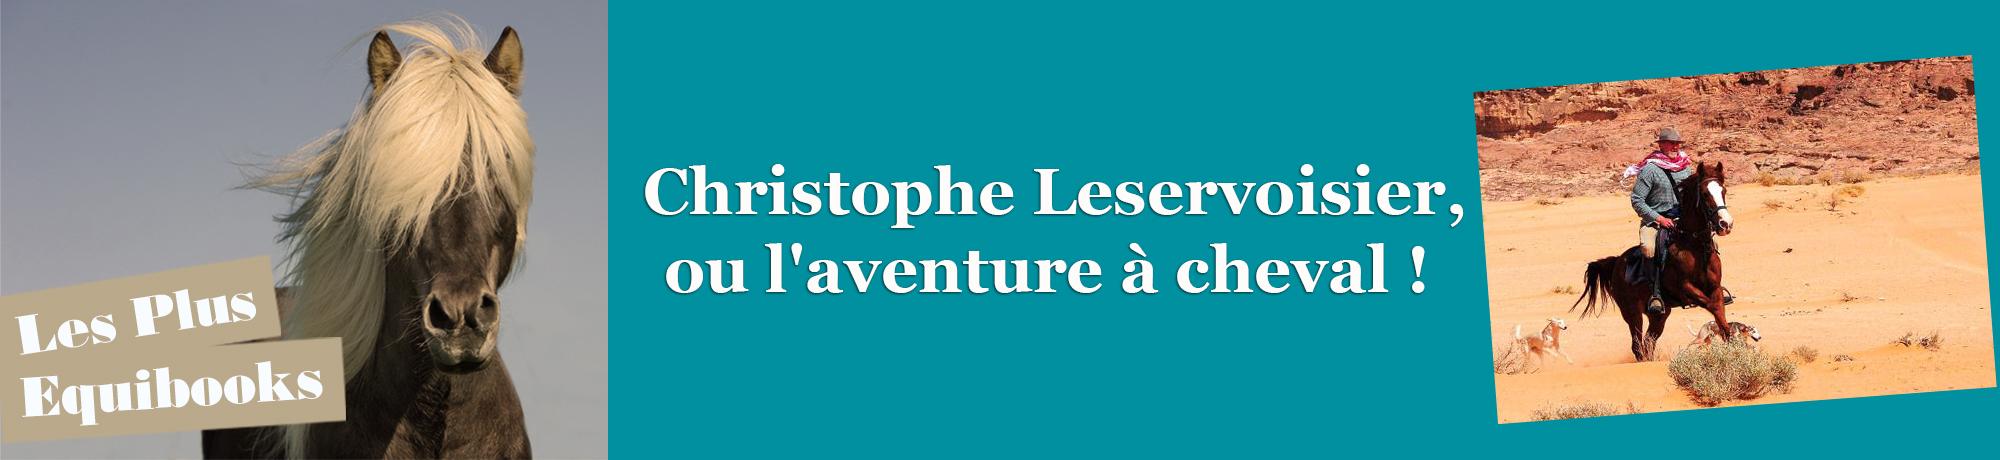 n°5 / Christophe Leservoisier, ou l'aventure à cheval